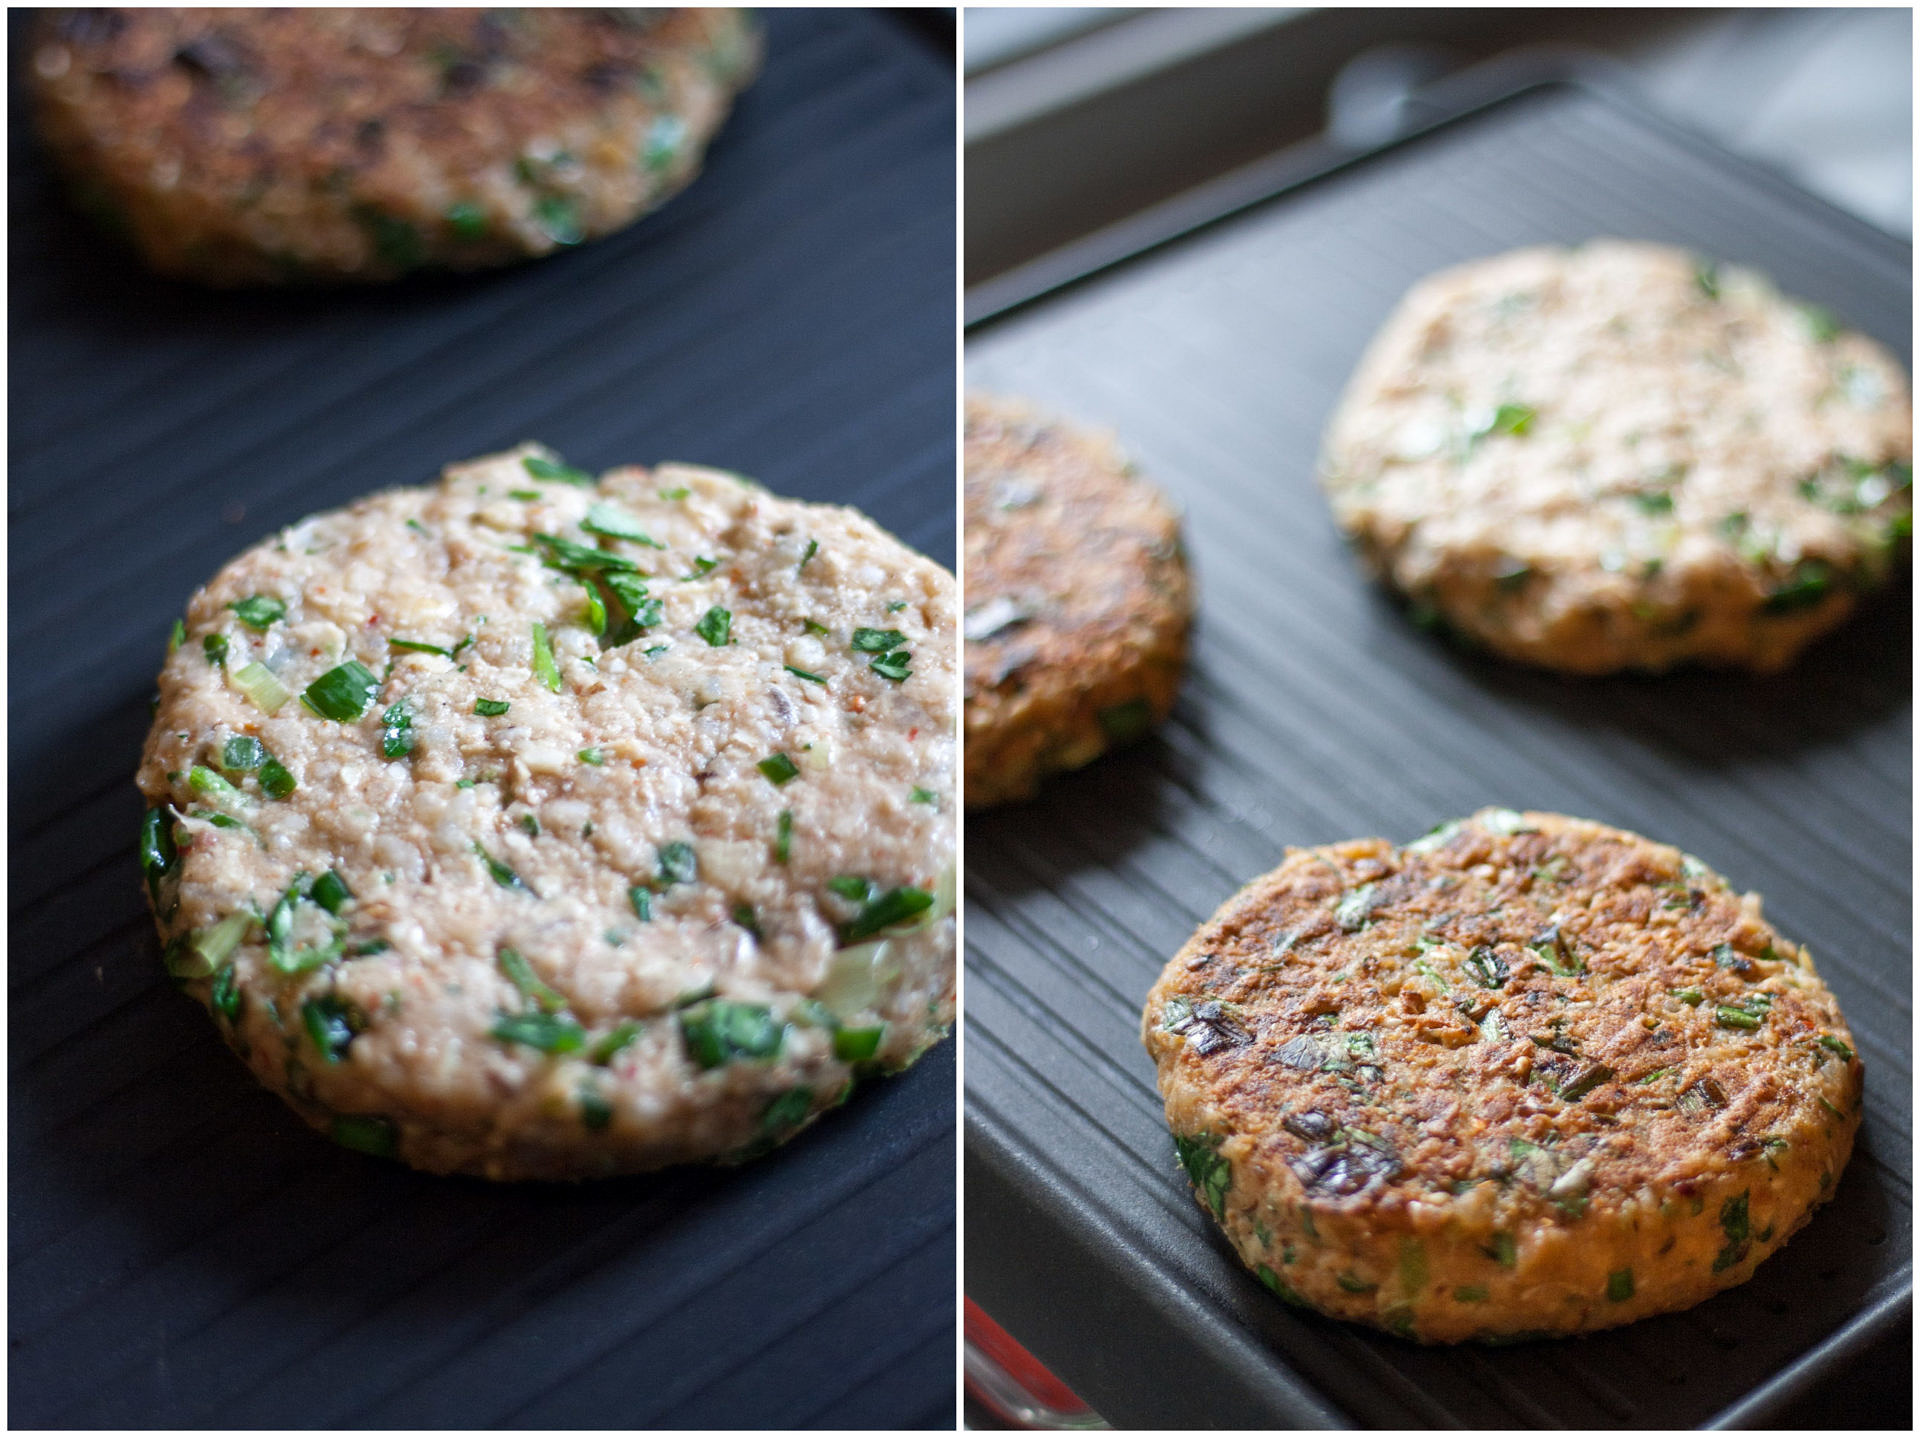 Grilling Veggie Burgers